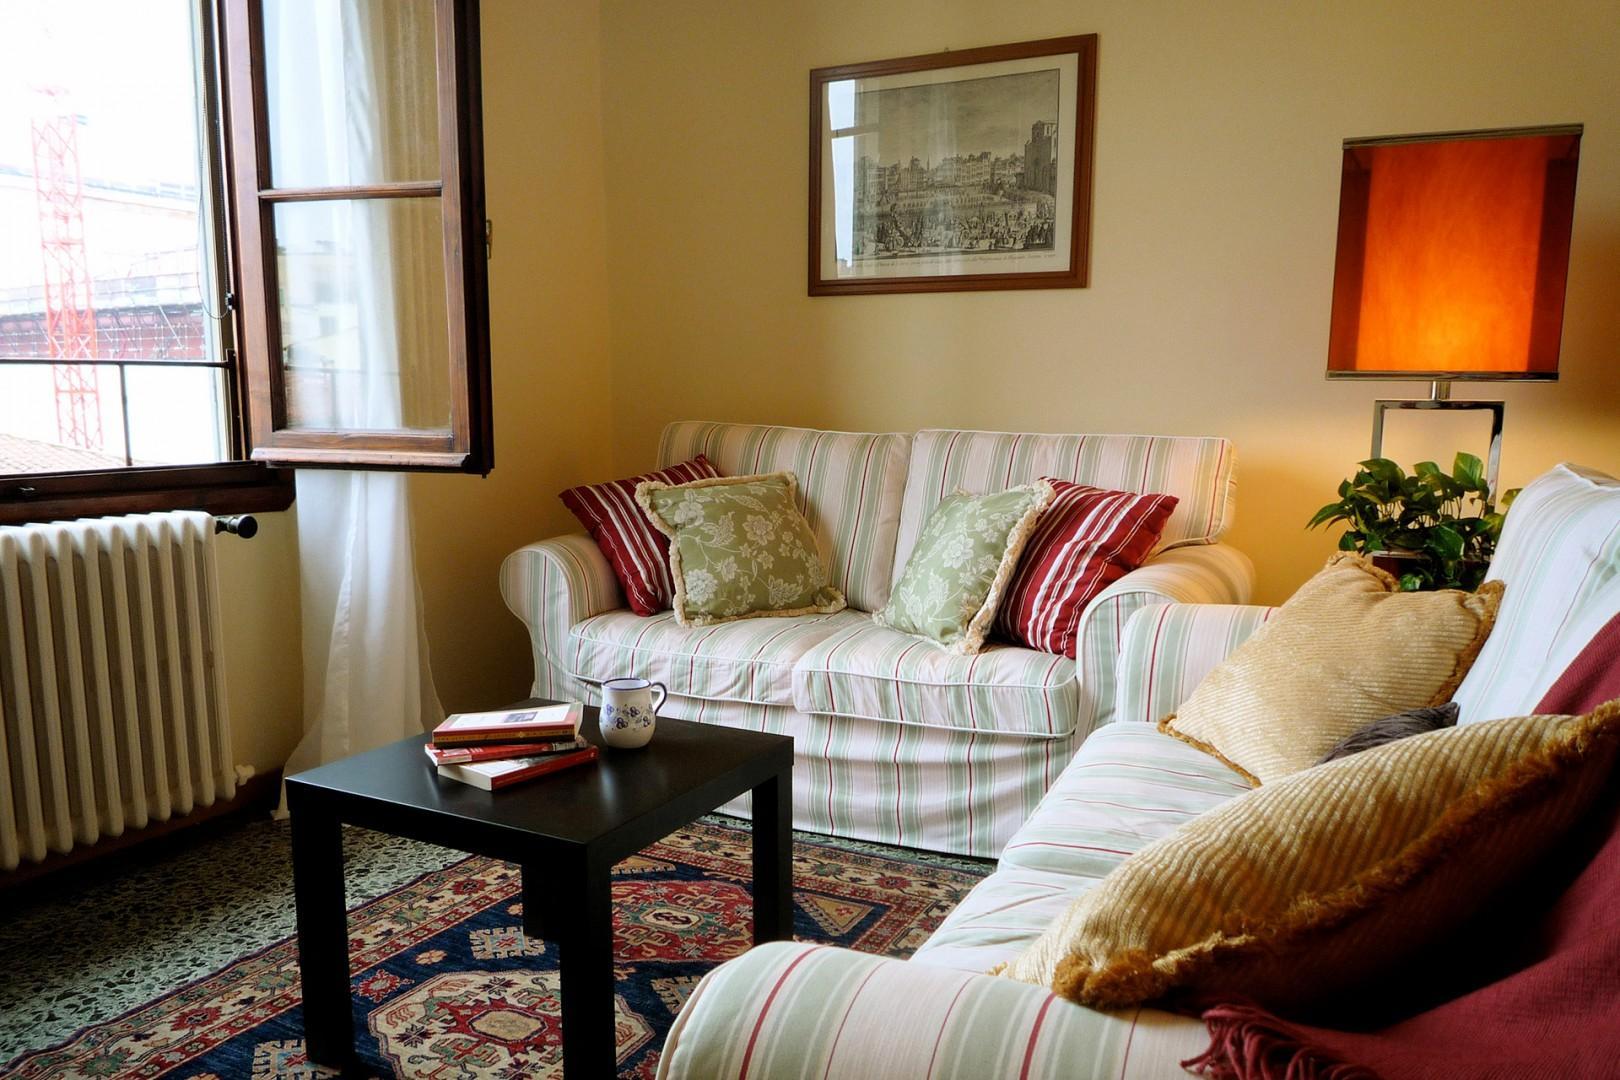 Large living room window admits lots of light. Original polished terrazzo floors.